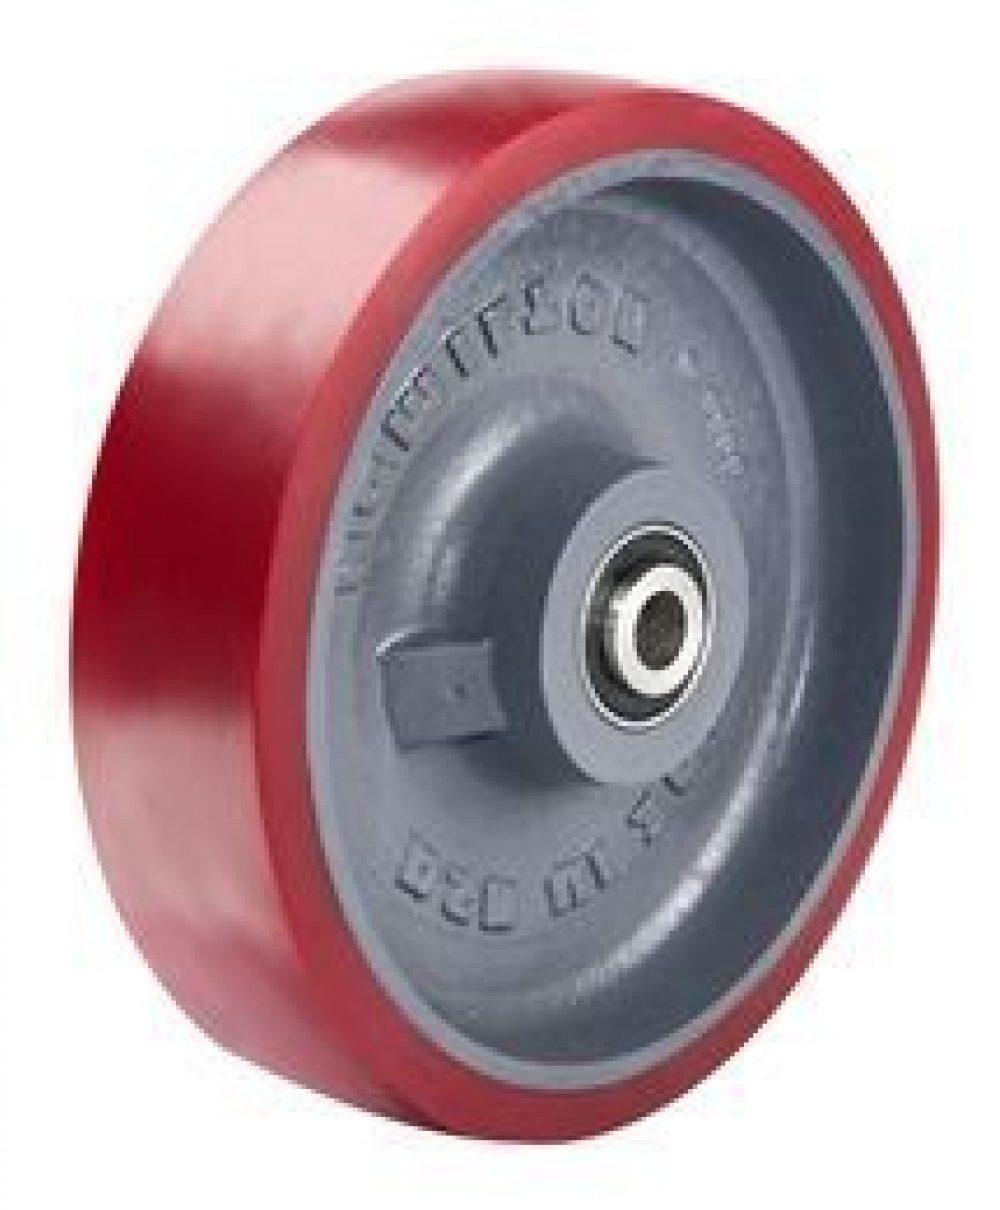 Hamilton wheel w 820 trb 12